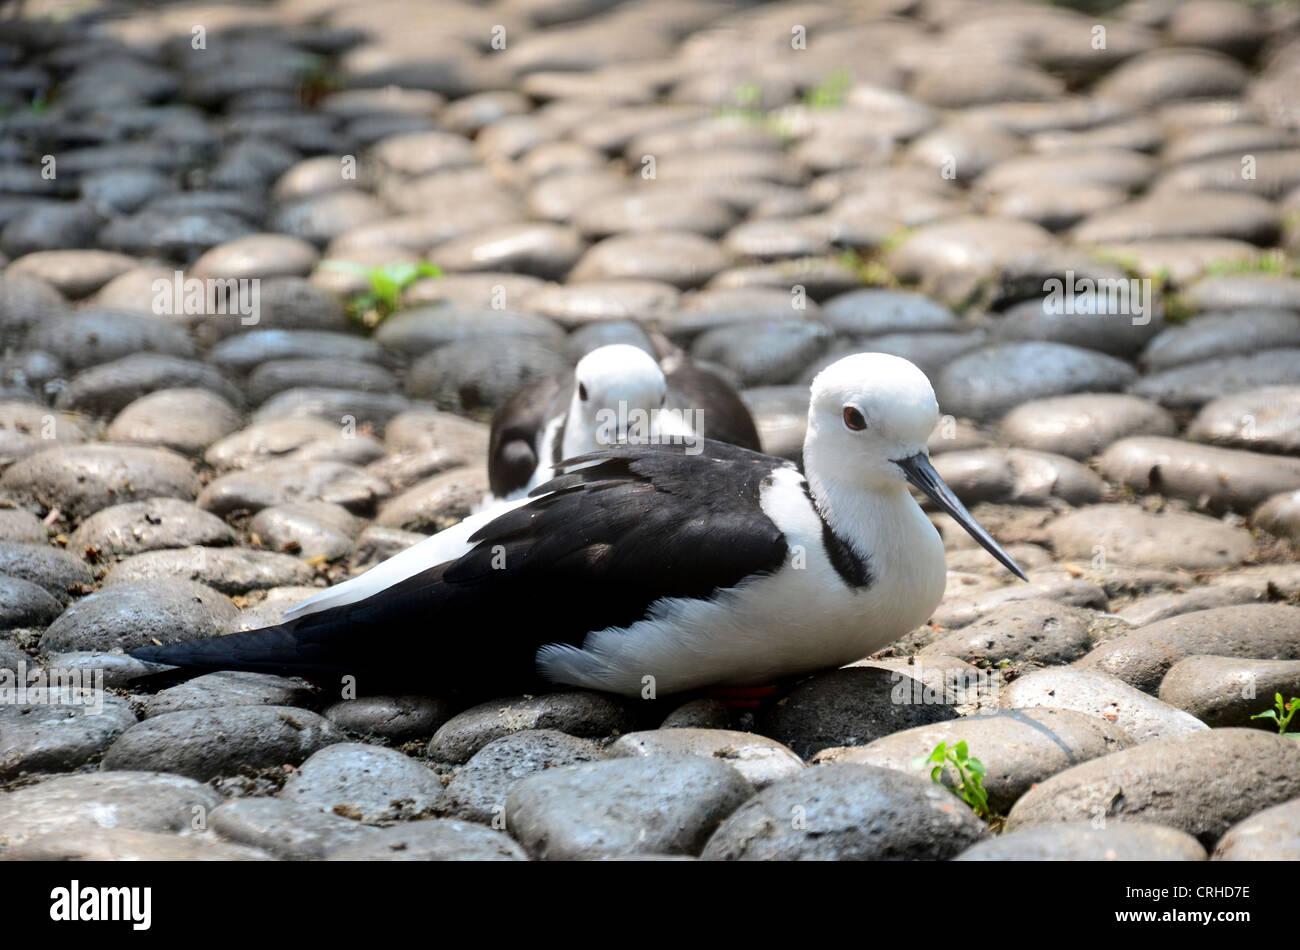 birds Black-Winged Stilt - Stock Image